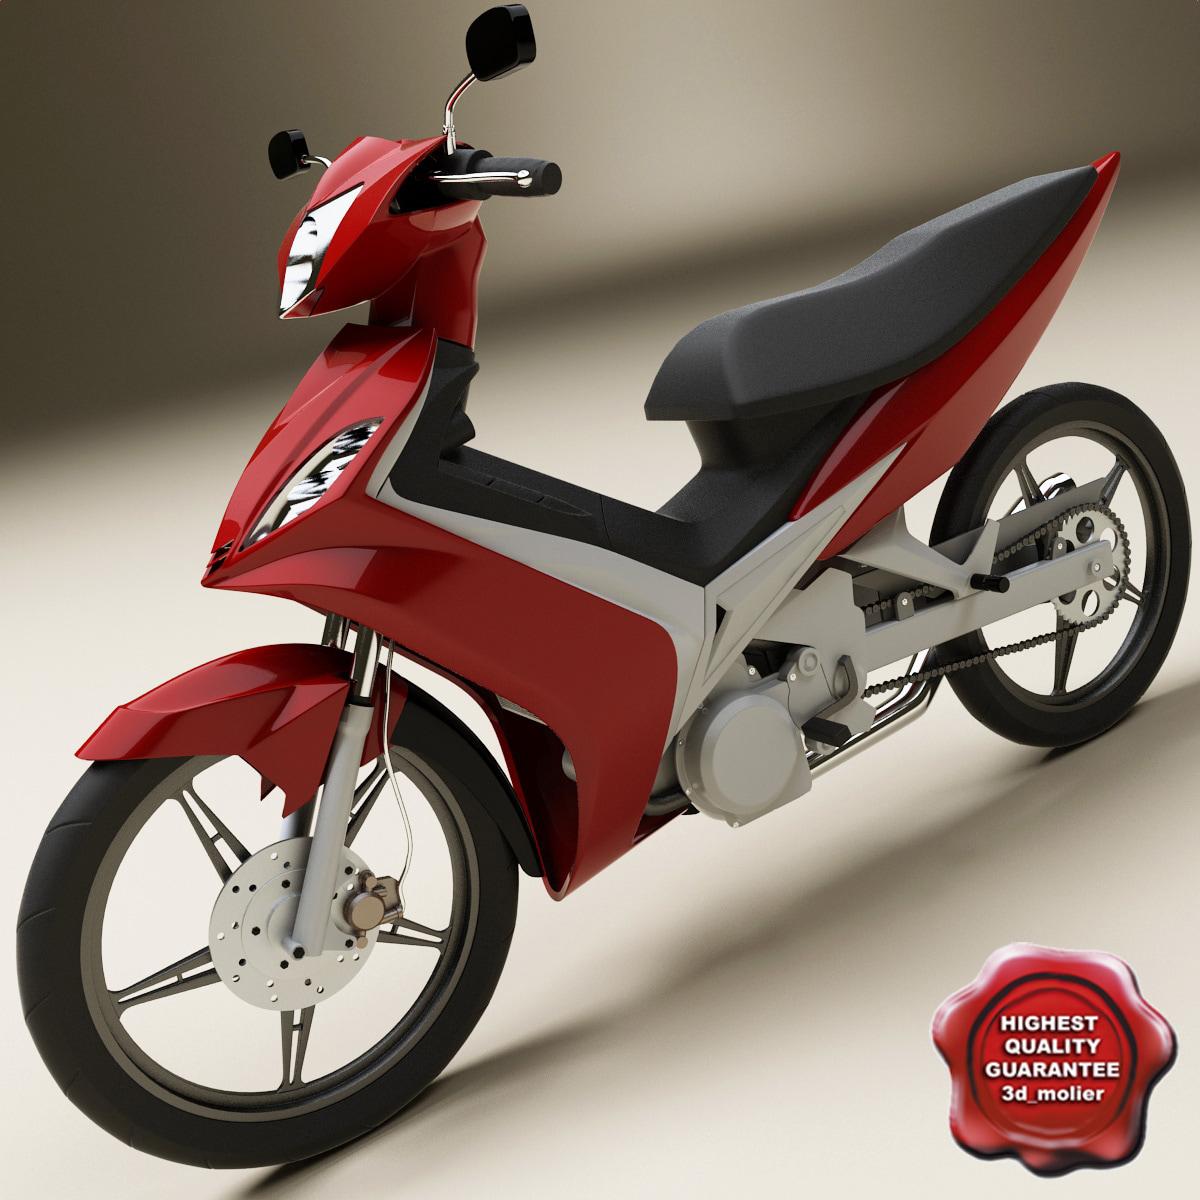 Motorcycle_Yamaha_Jupiter_MX_00.jpg